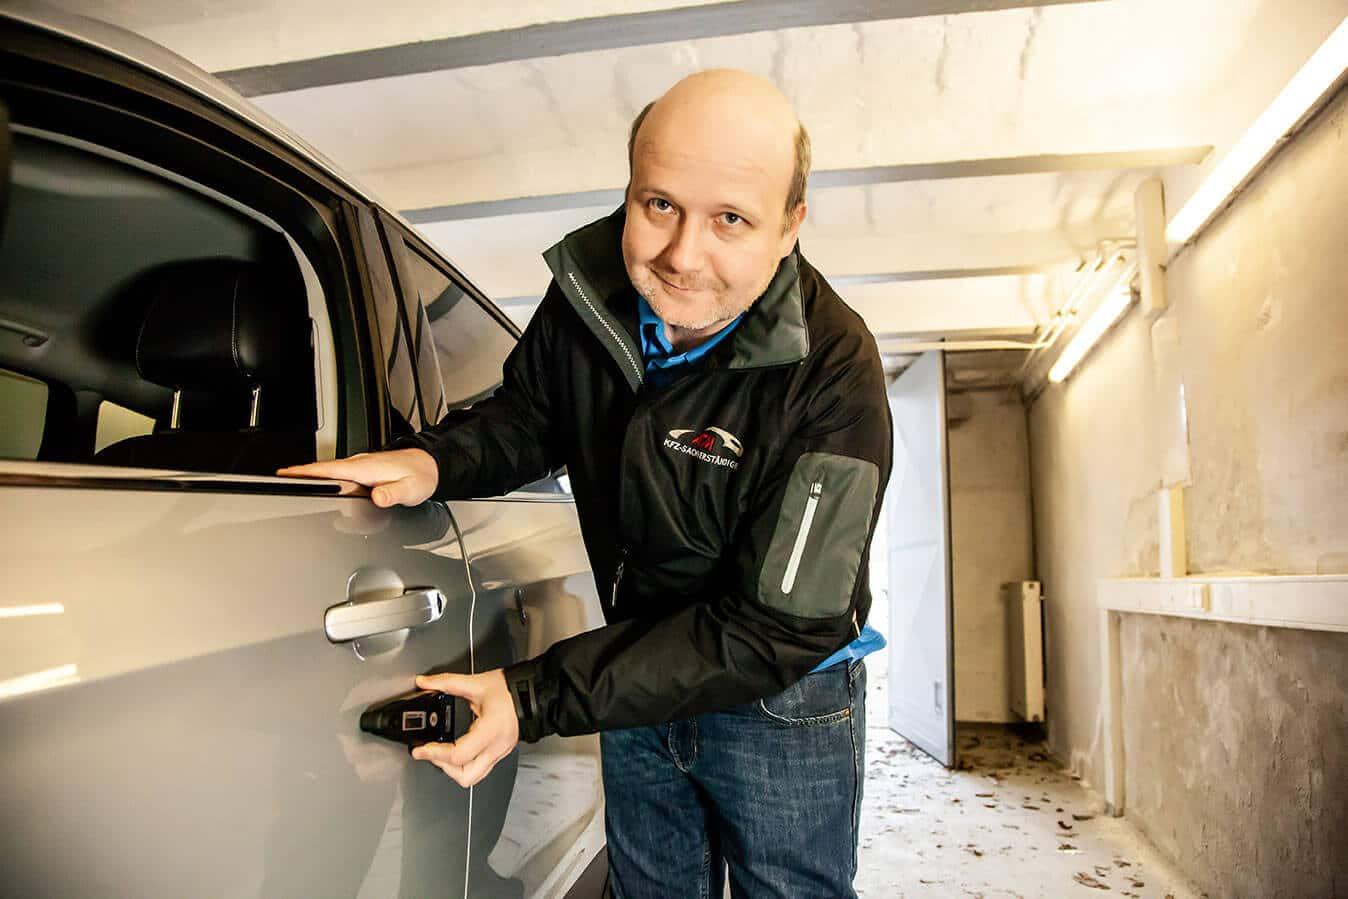 fahrzeugbewertungen - FAHRZEUGBEWERTUNG2 - Fahrzeugbewertung